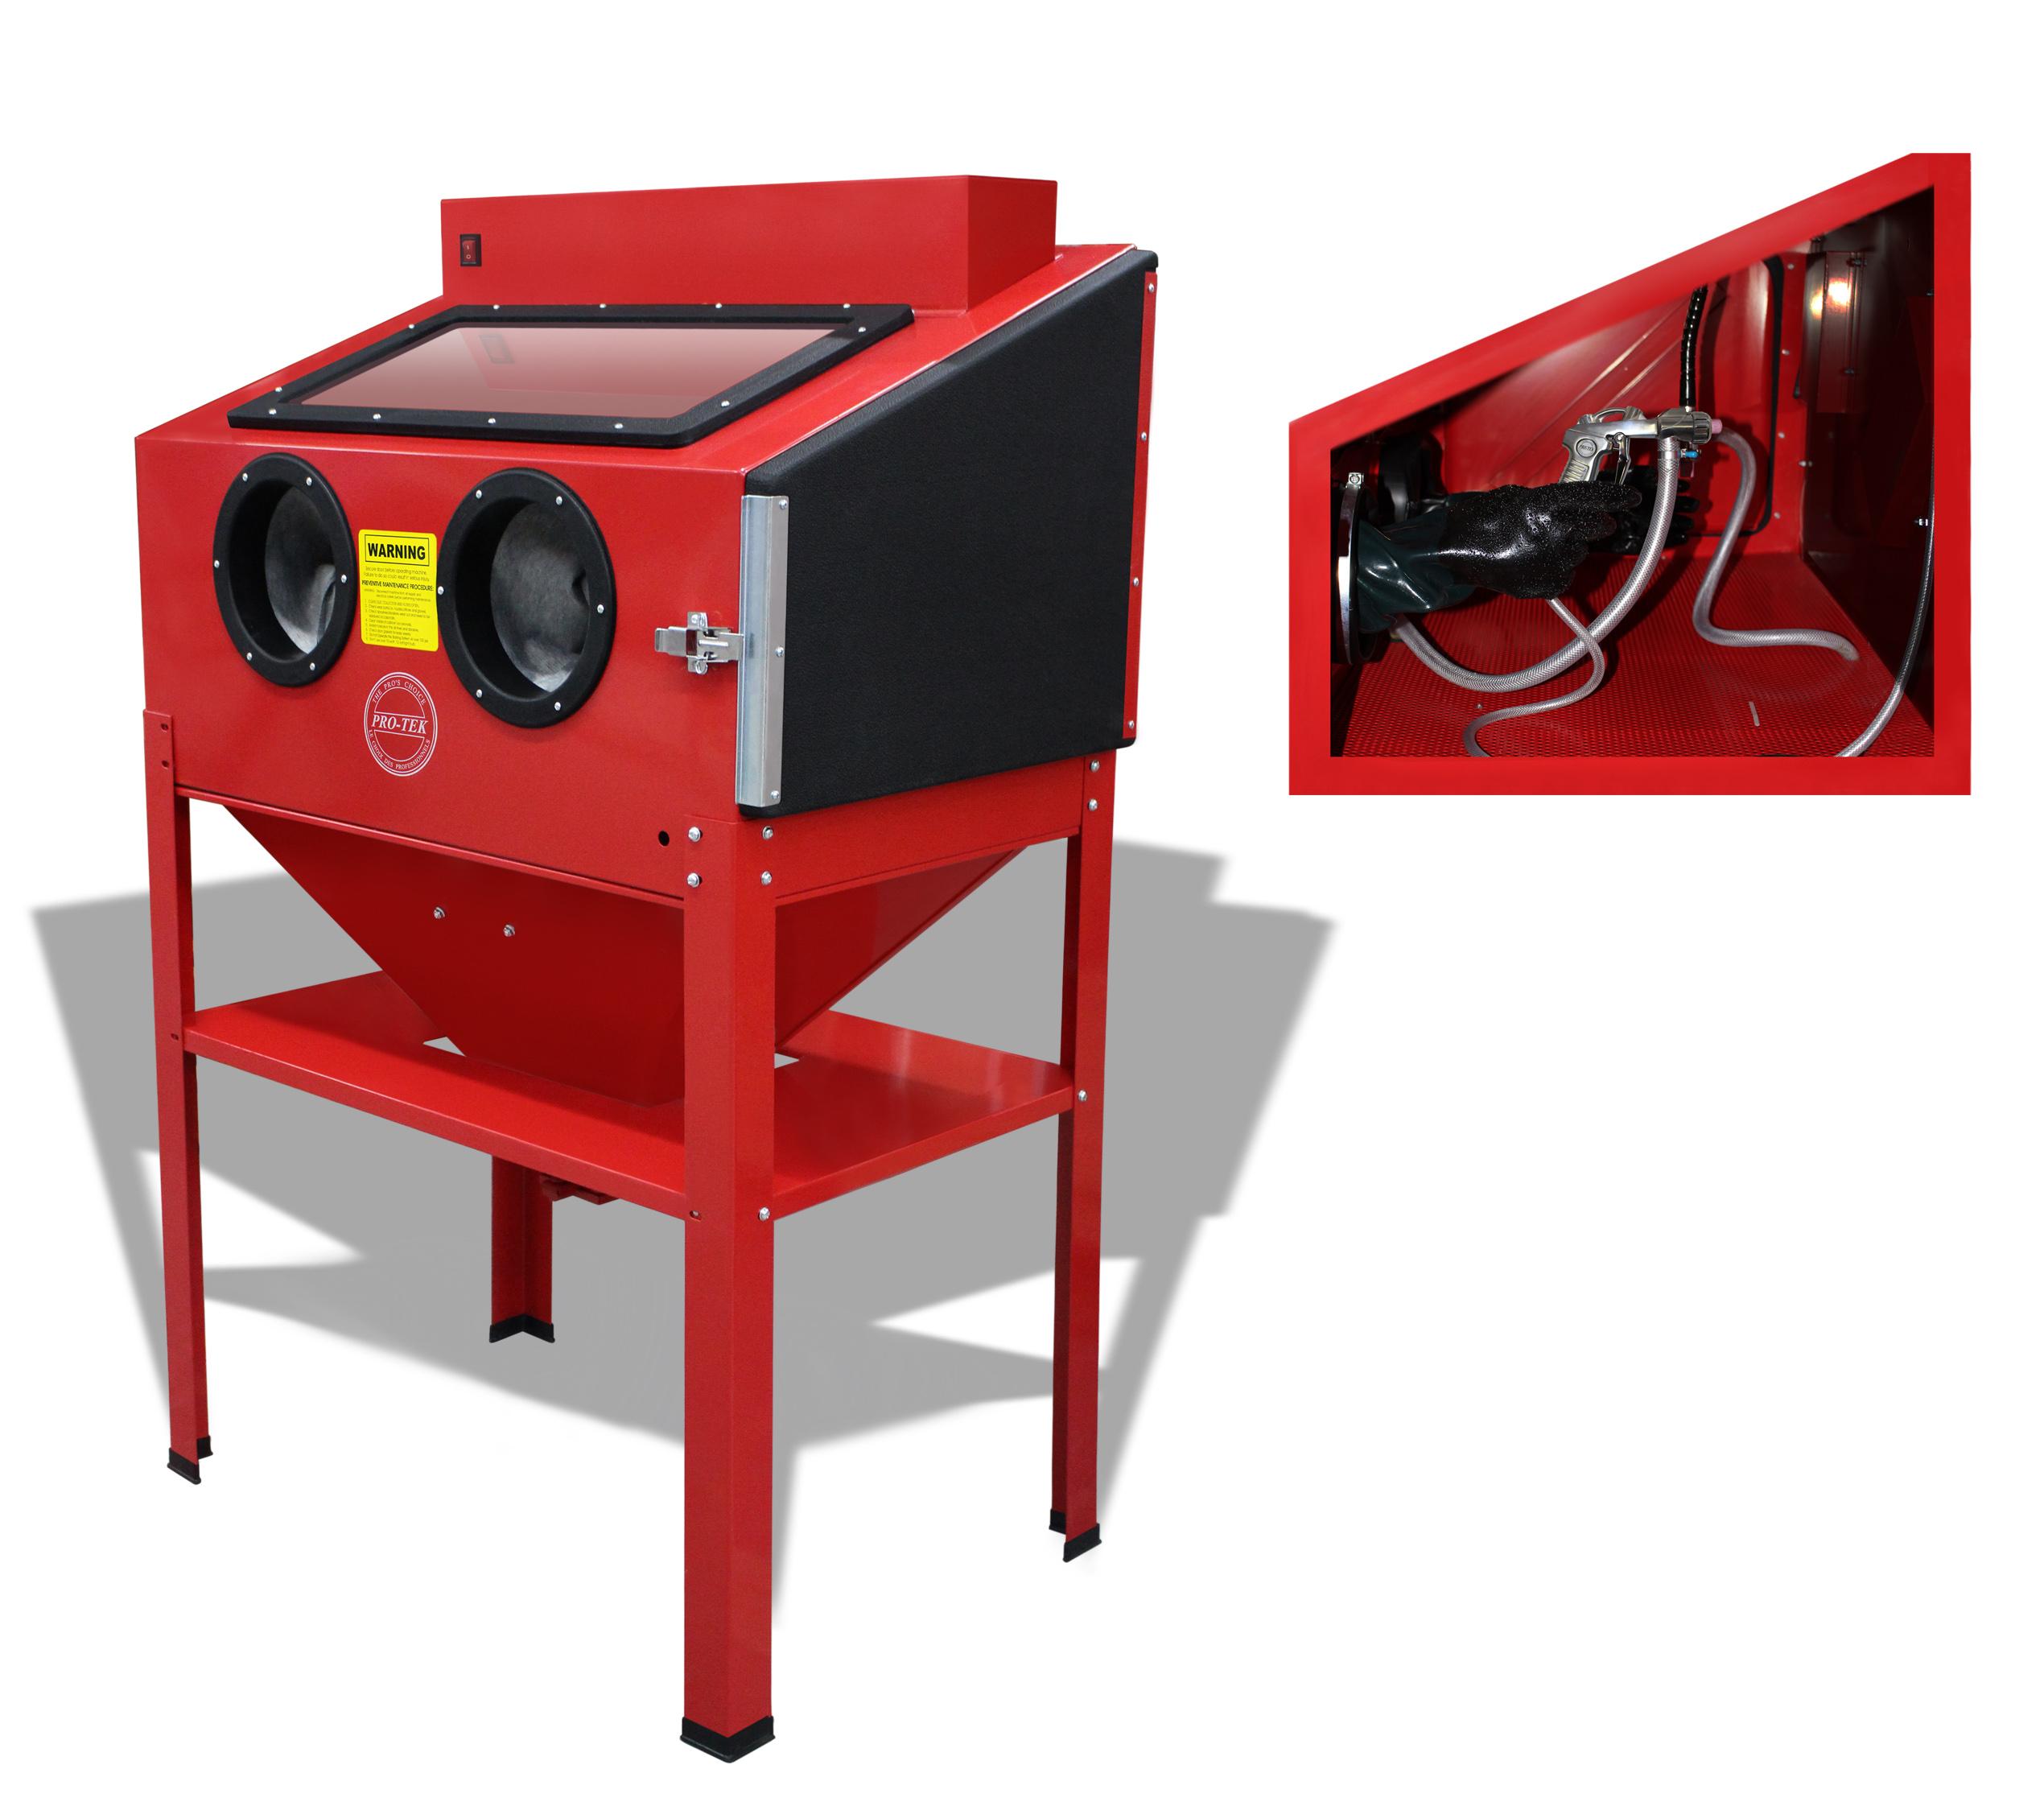 heavy duty sandblasting cabinet pro. Black Bedroom Furniture Sets. Home Design Ideas